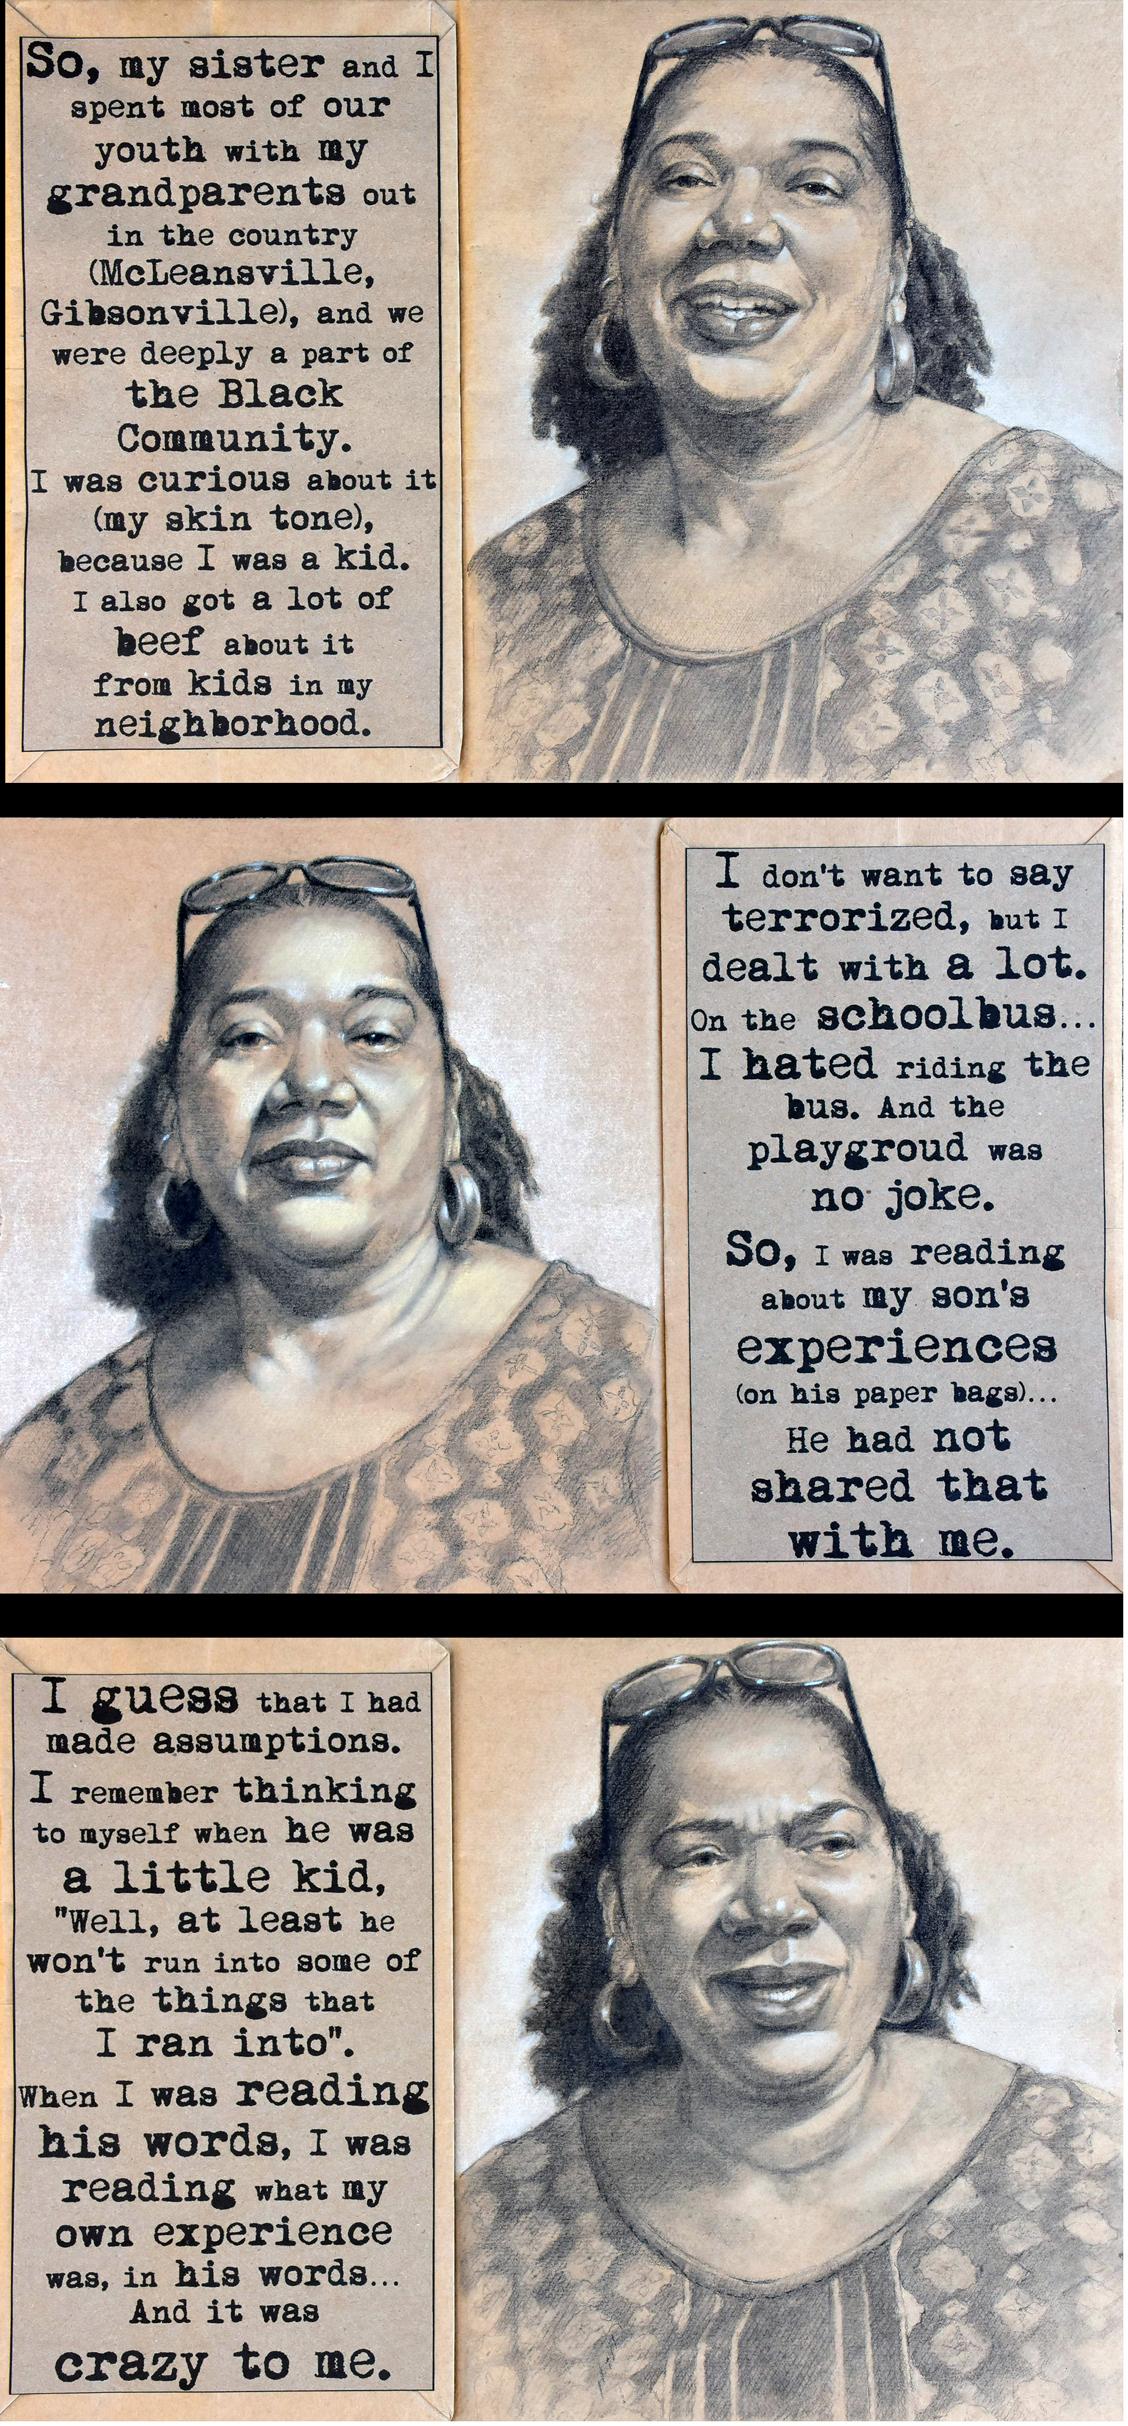 The Mother Harrington Interview I - III